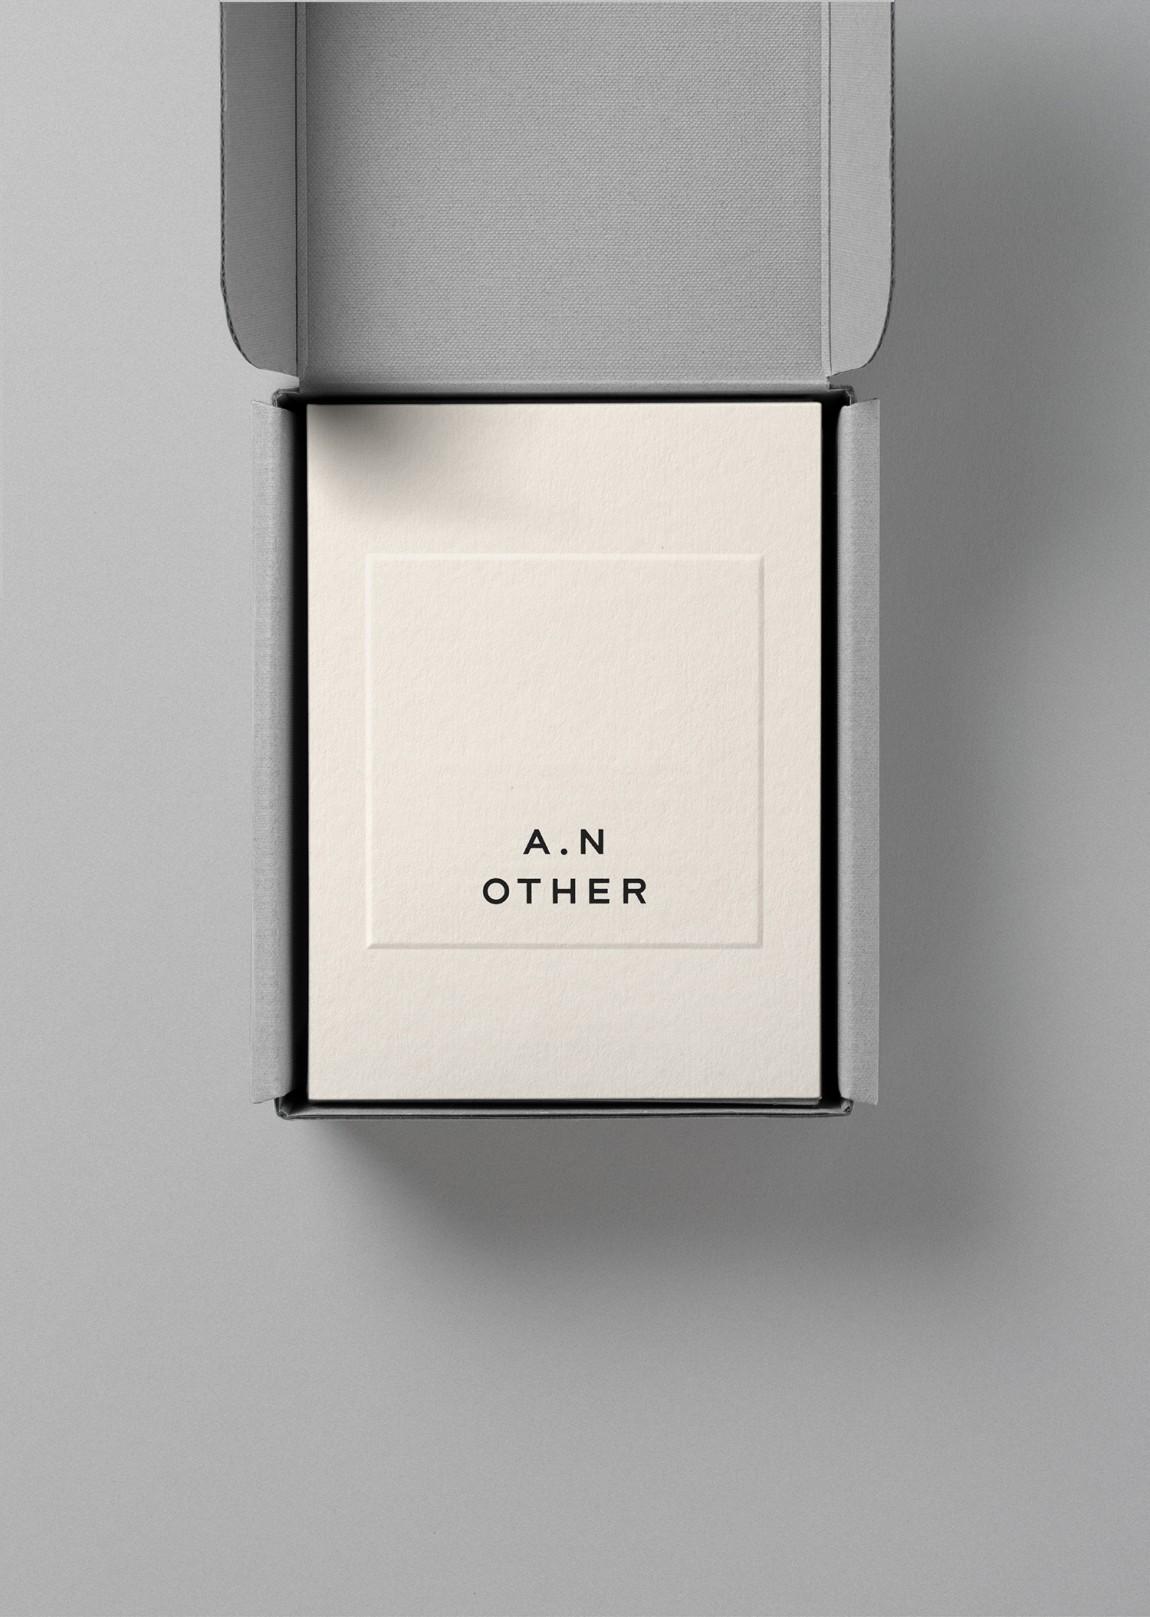 A.N Other品牌策划设计全案,,产品包装设计